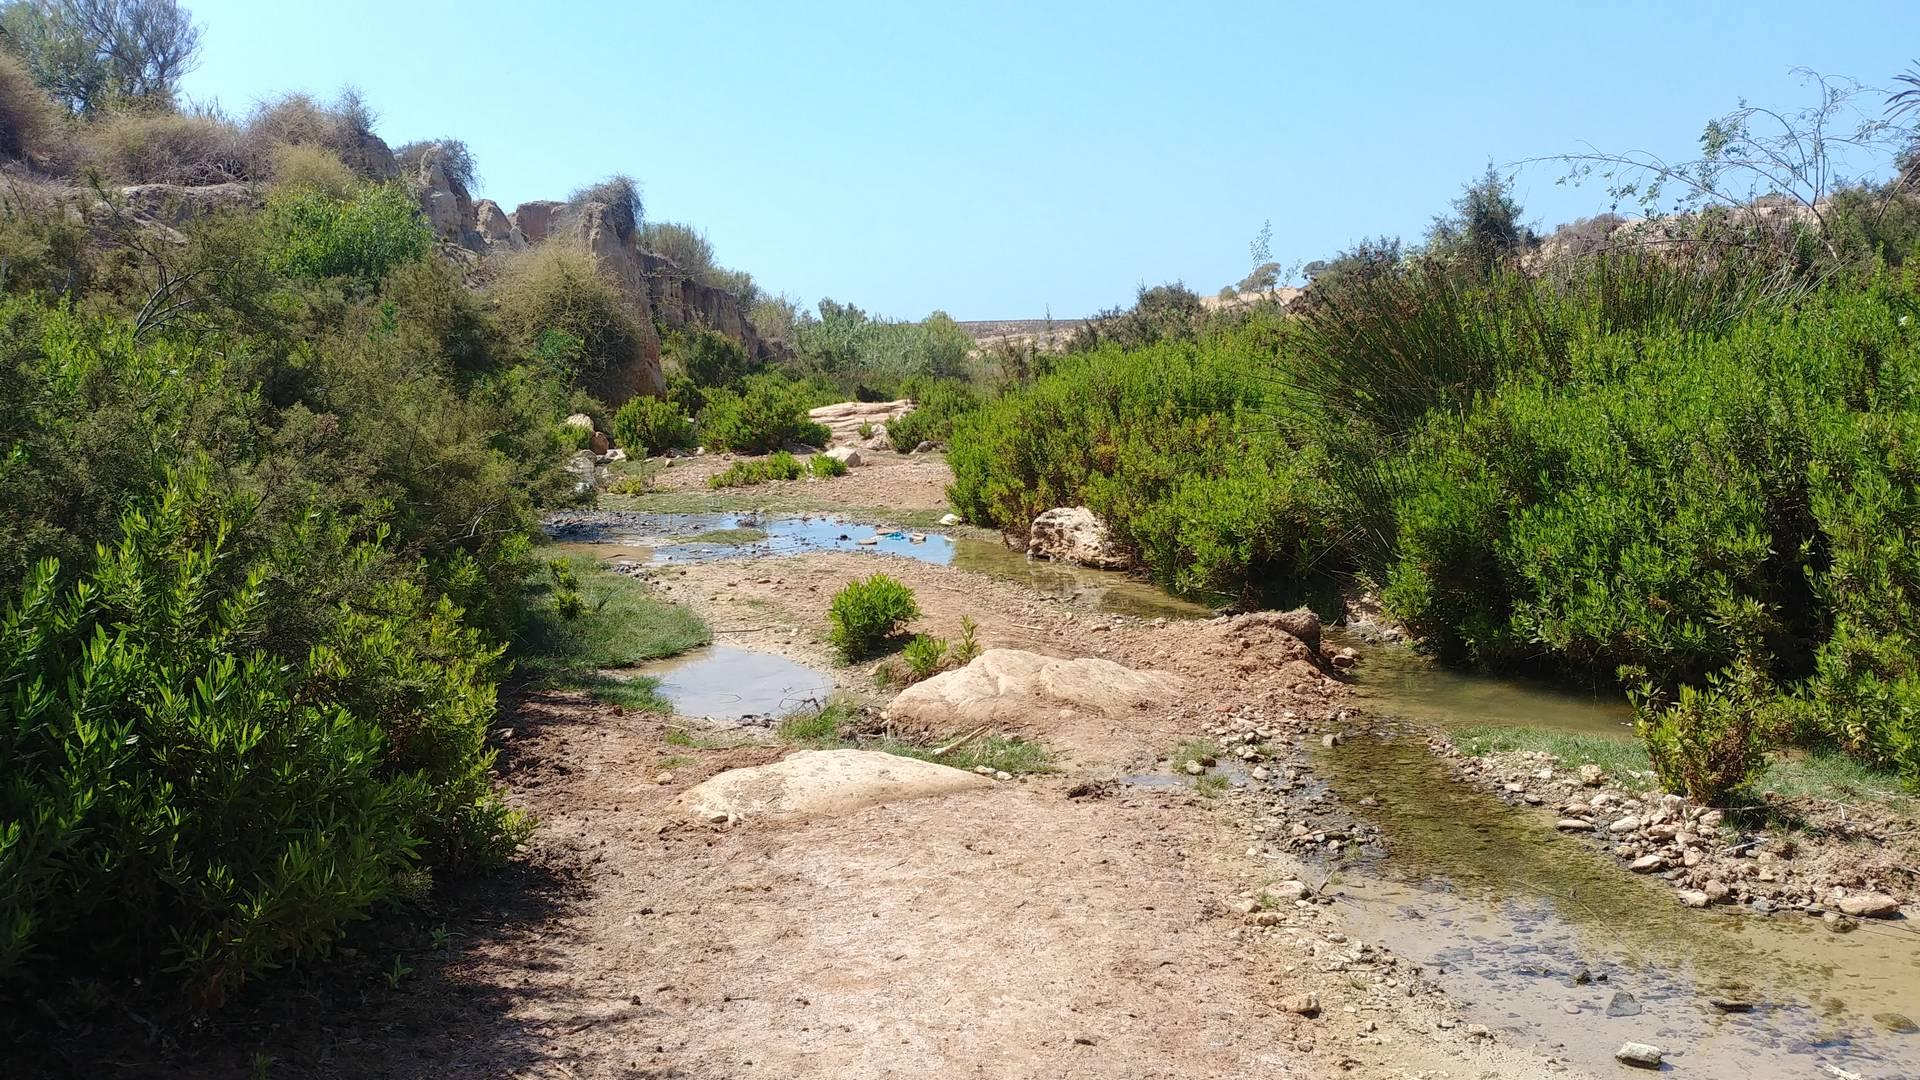 Maroc - Oasis, randonnée à cheval à Essaouira